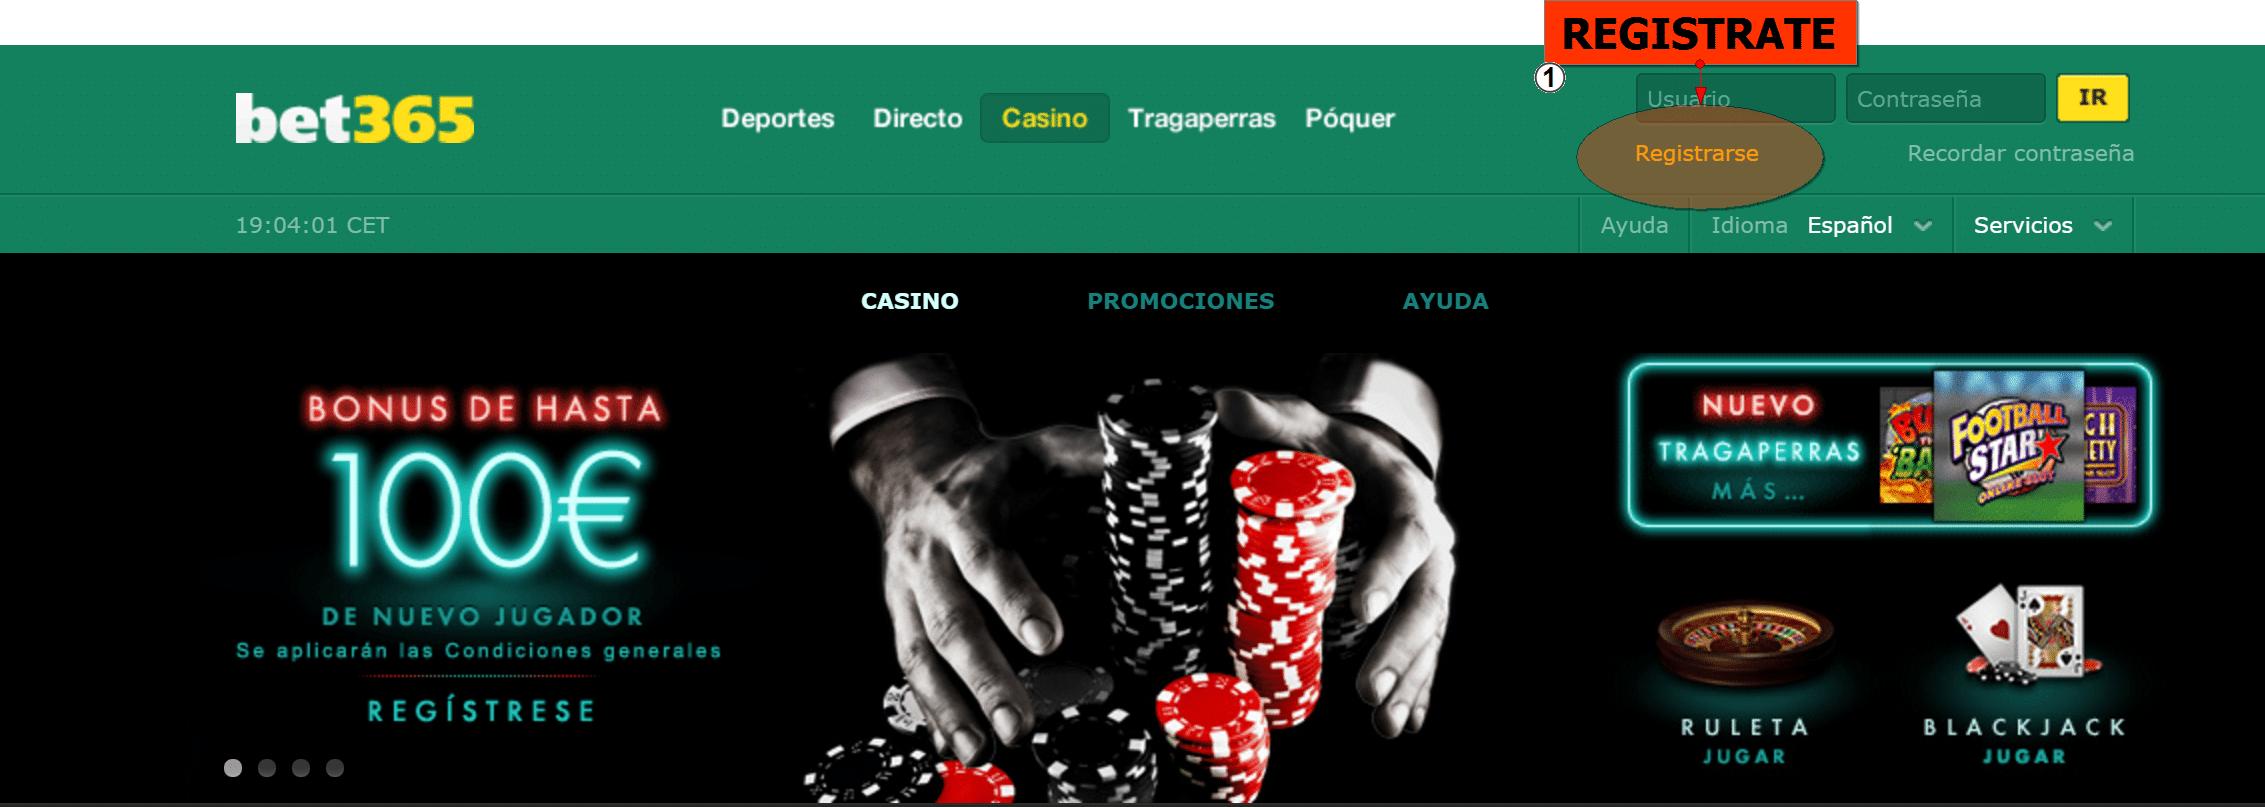 Bet365 100€ bonos bono de ingreso apuestas deportivas-164990